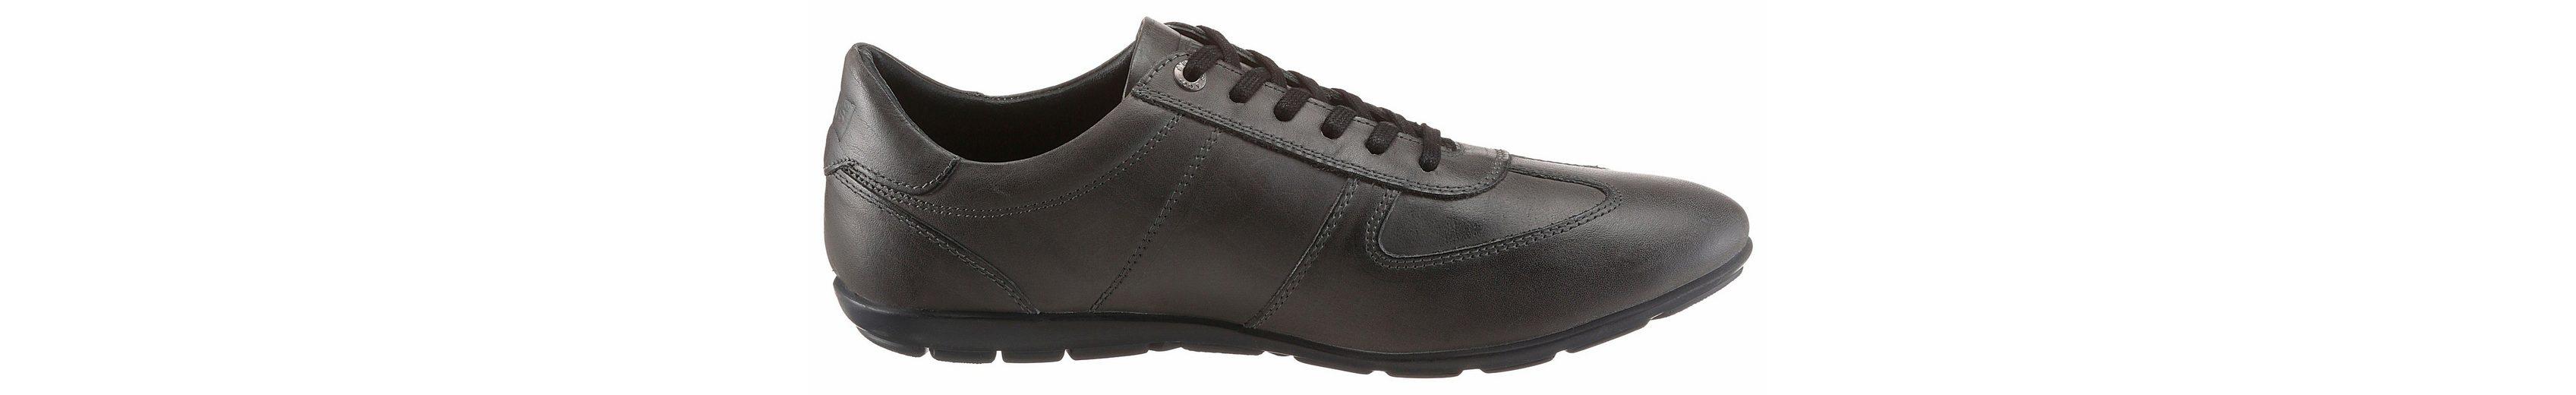 Levi's® Chula Vista Sneaker, mit gepolstertem Schaftrand